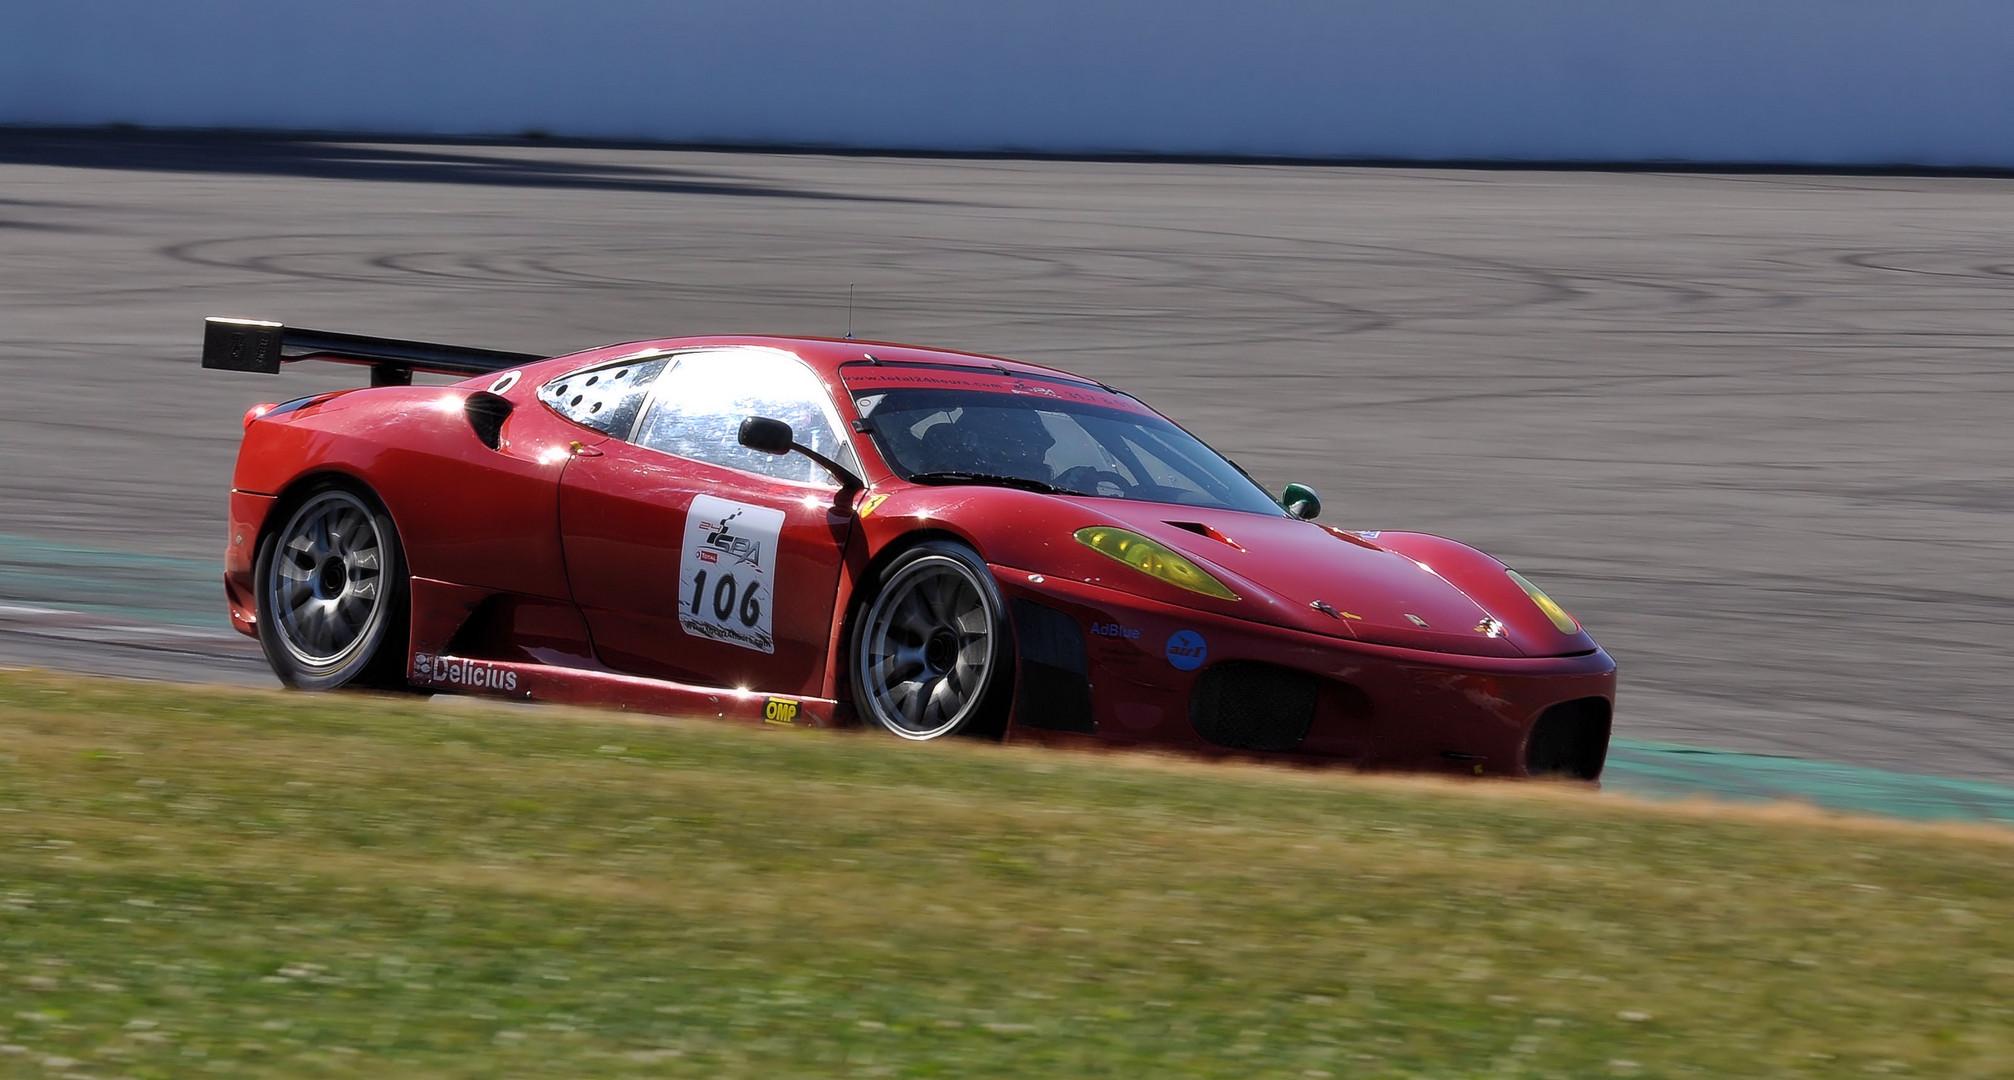 Ferrari allesisterlaubt Wochen #7